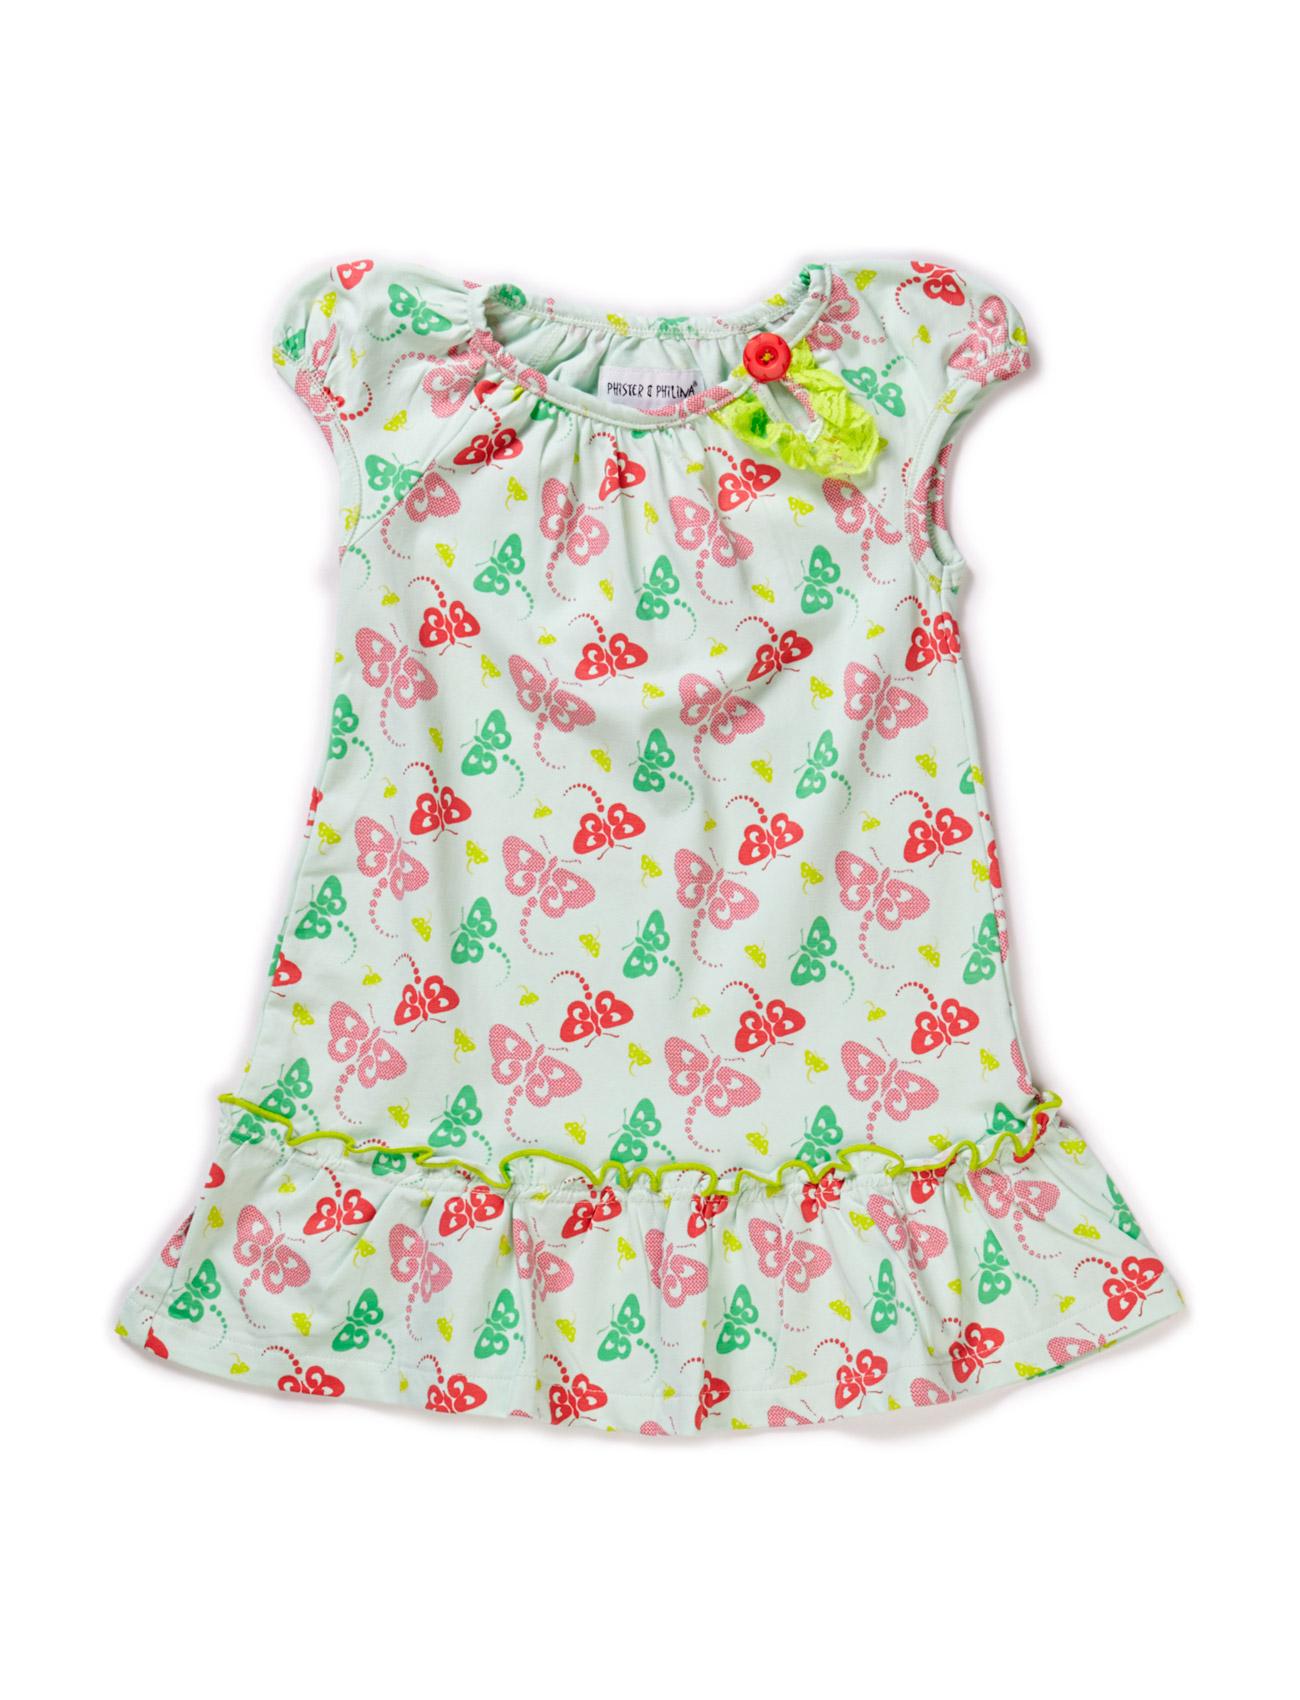 Fly Baby Girl Dress